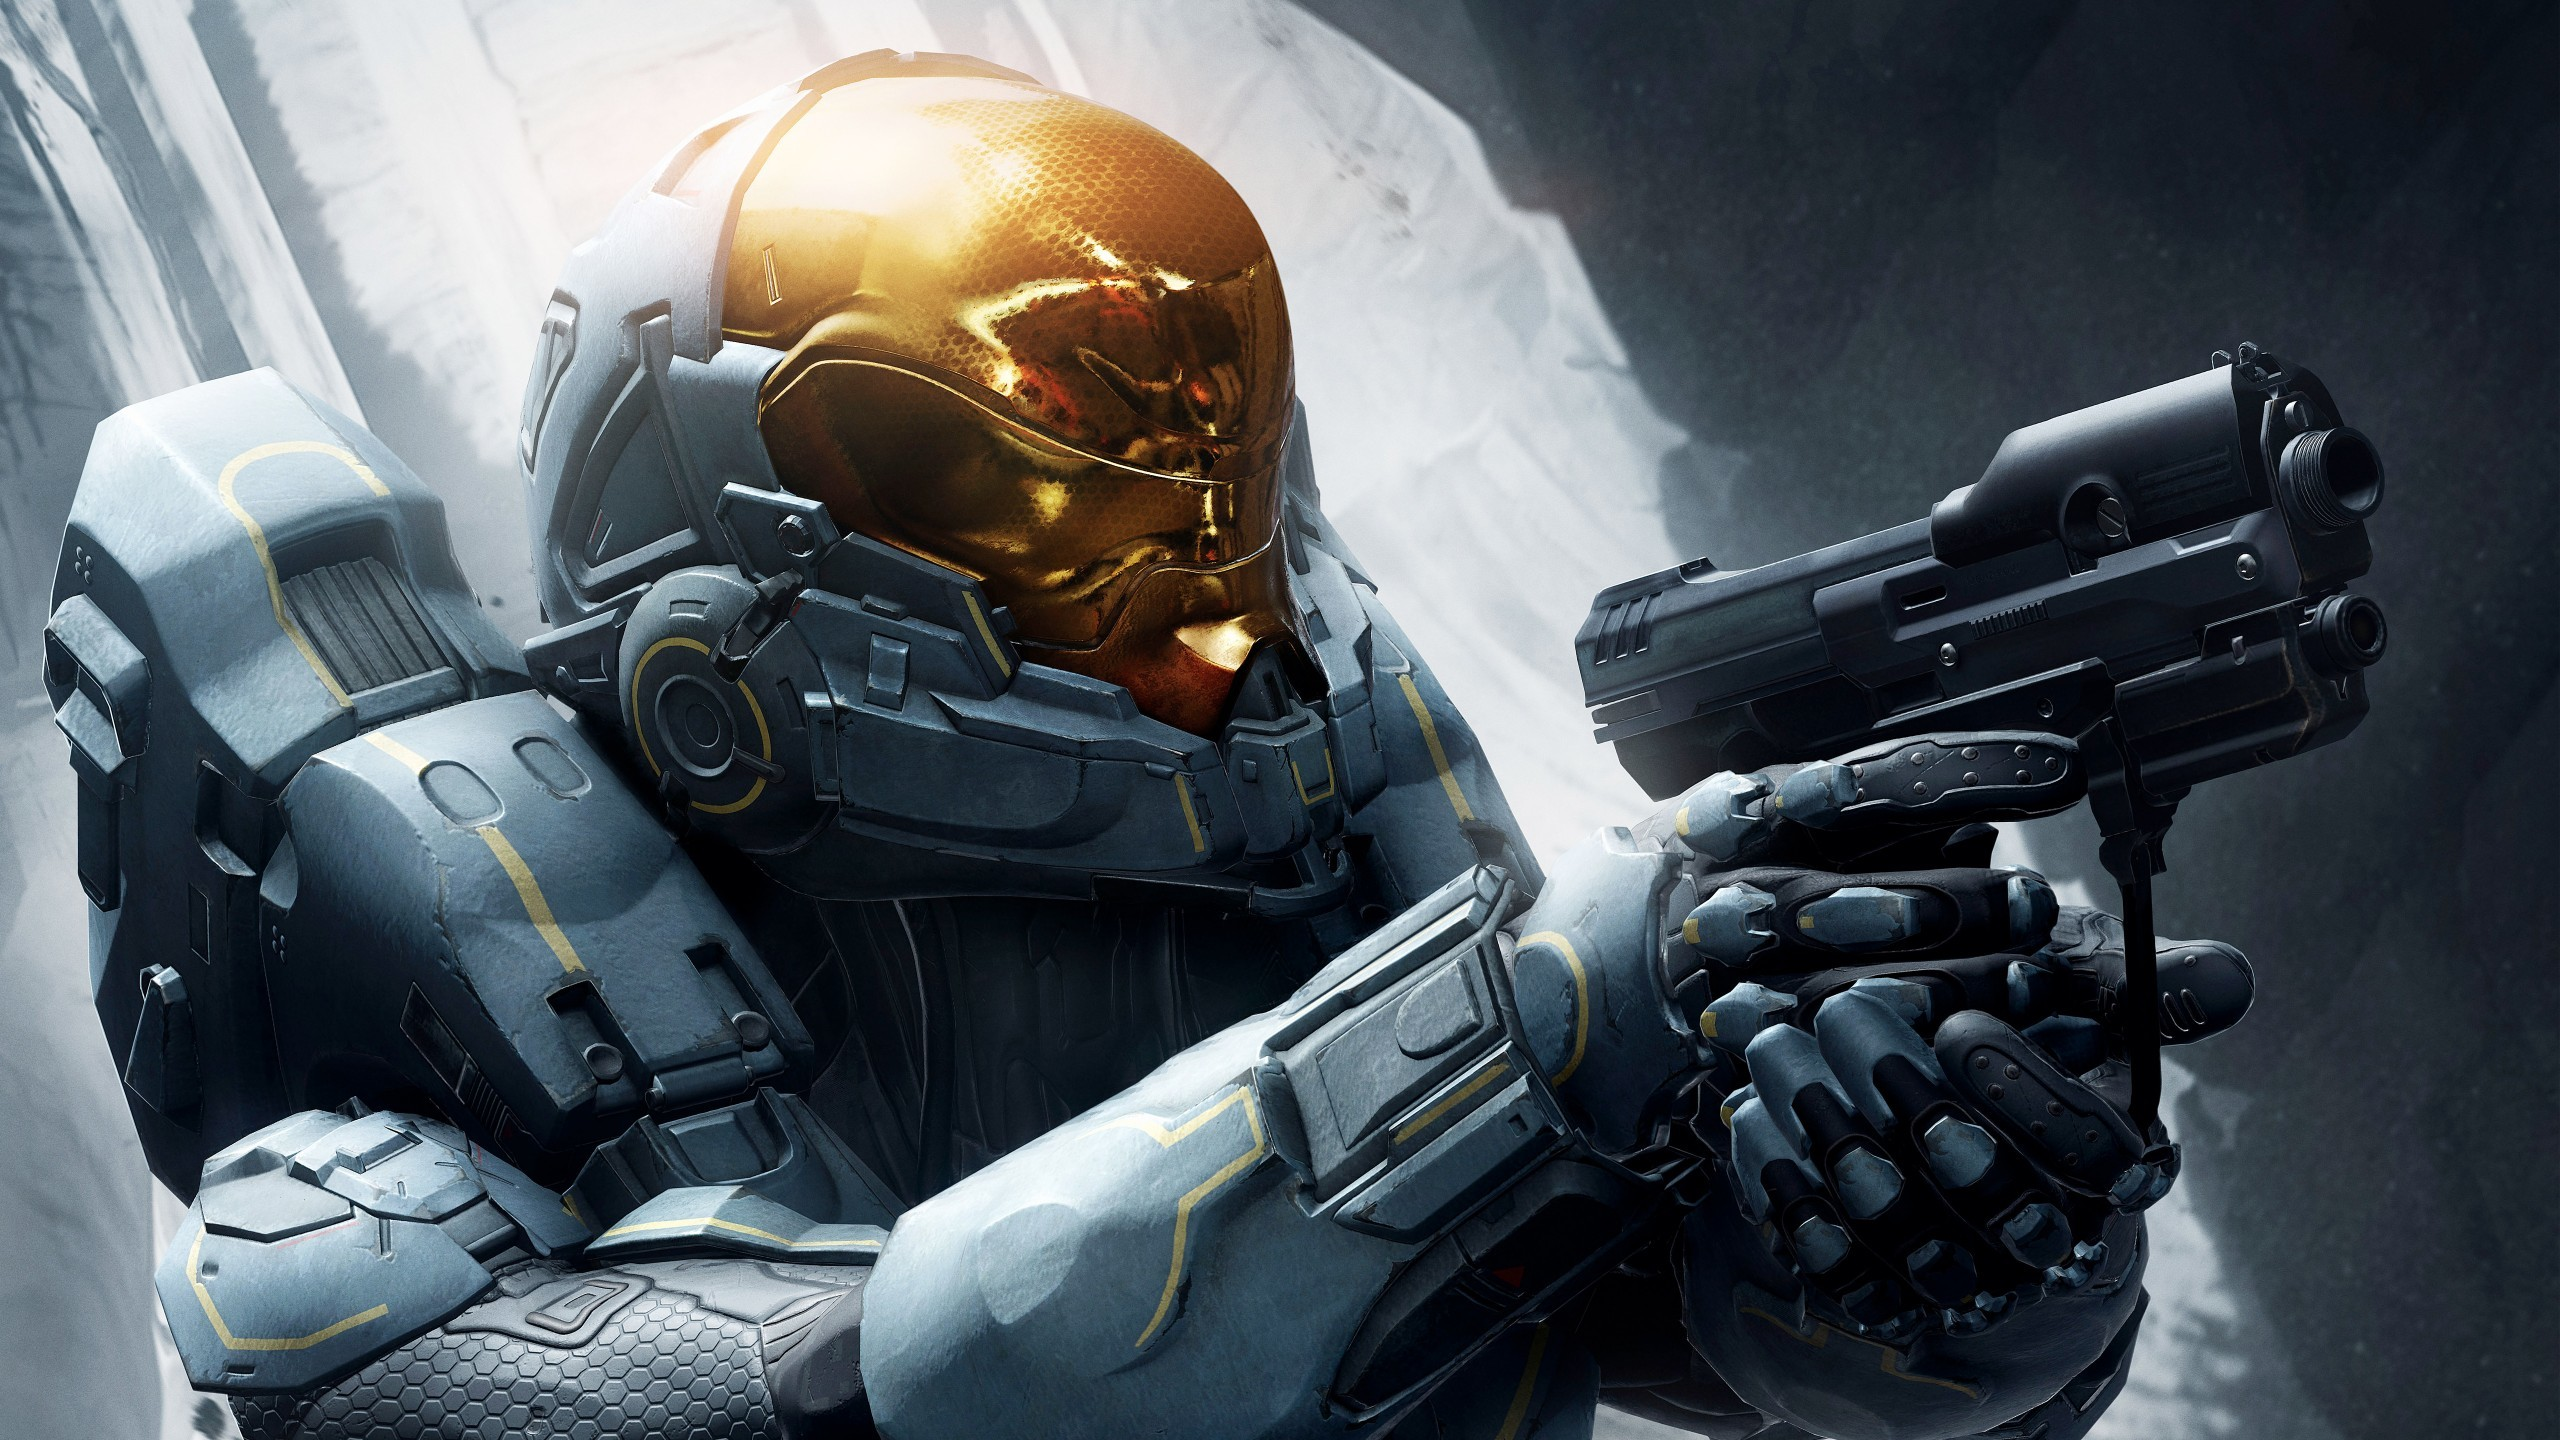 Games / Halo 5: Guardians Wallpaper